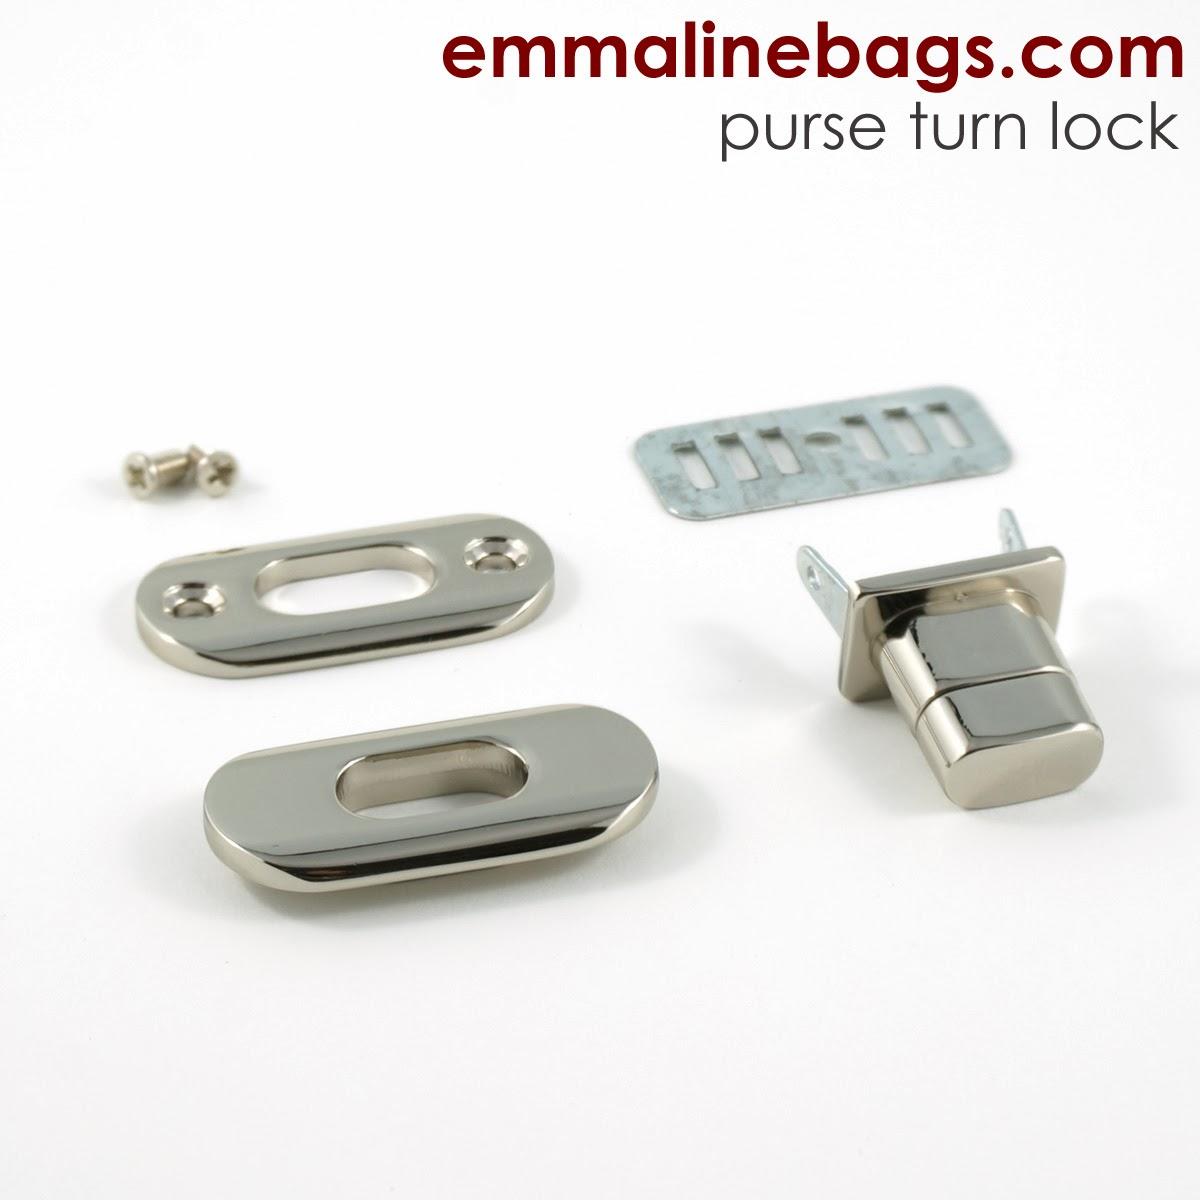 12 Pcs Lot Handbags Hardware Accessories Pale Golden Rotate The Lock Heart Metal Twist